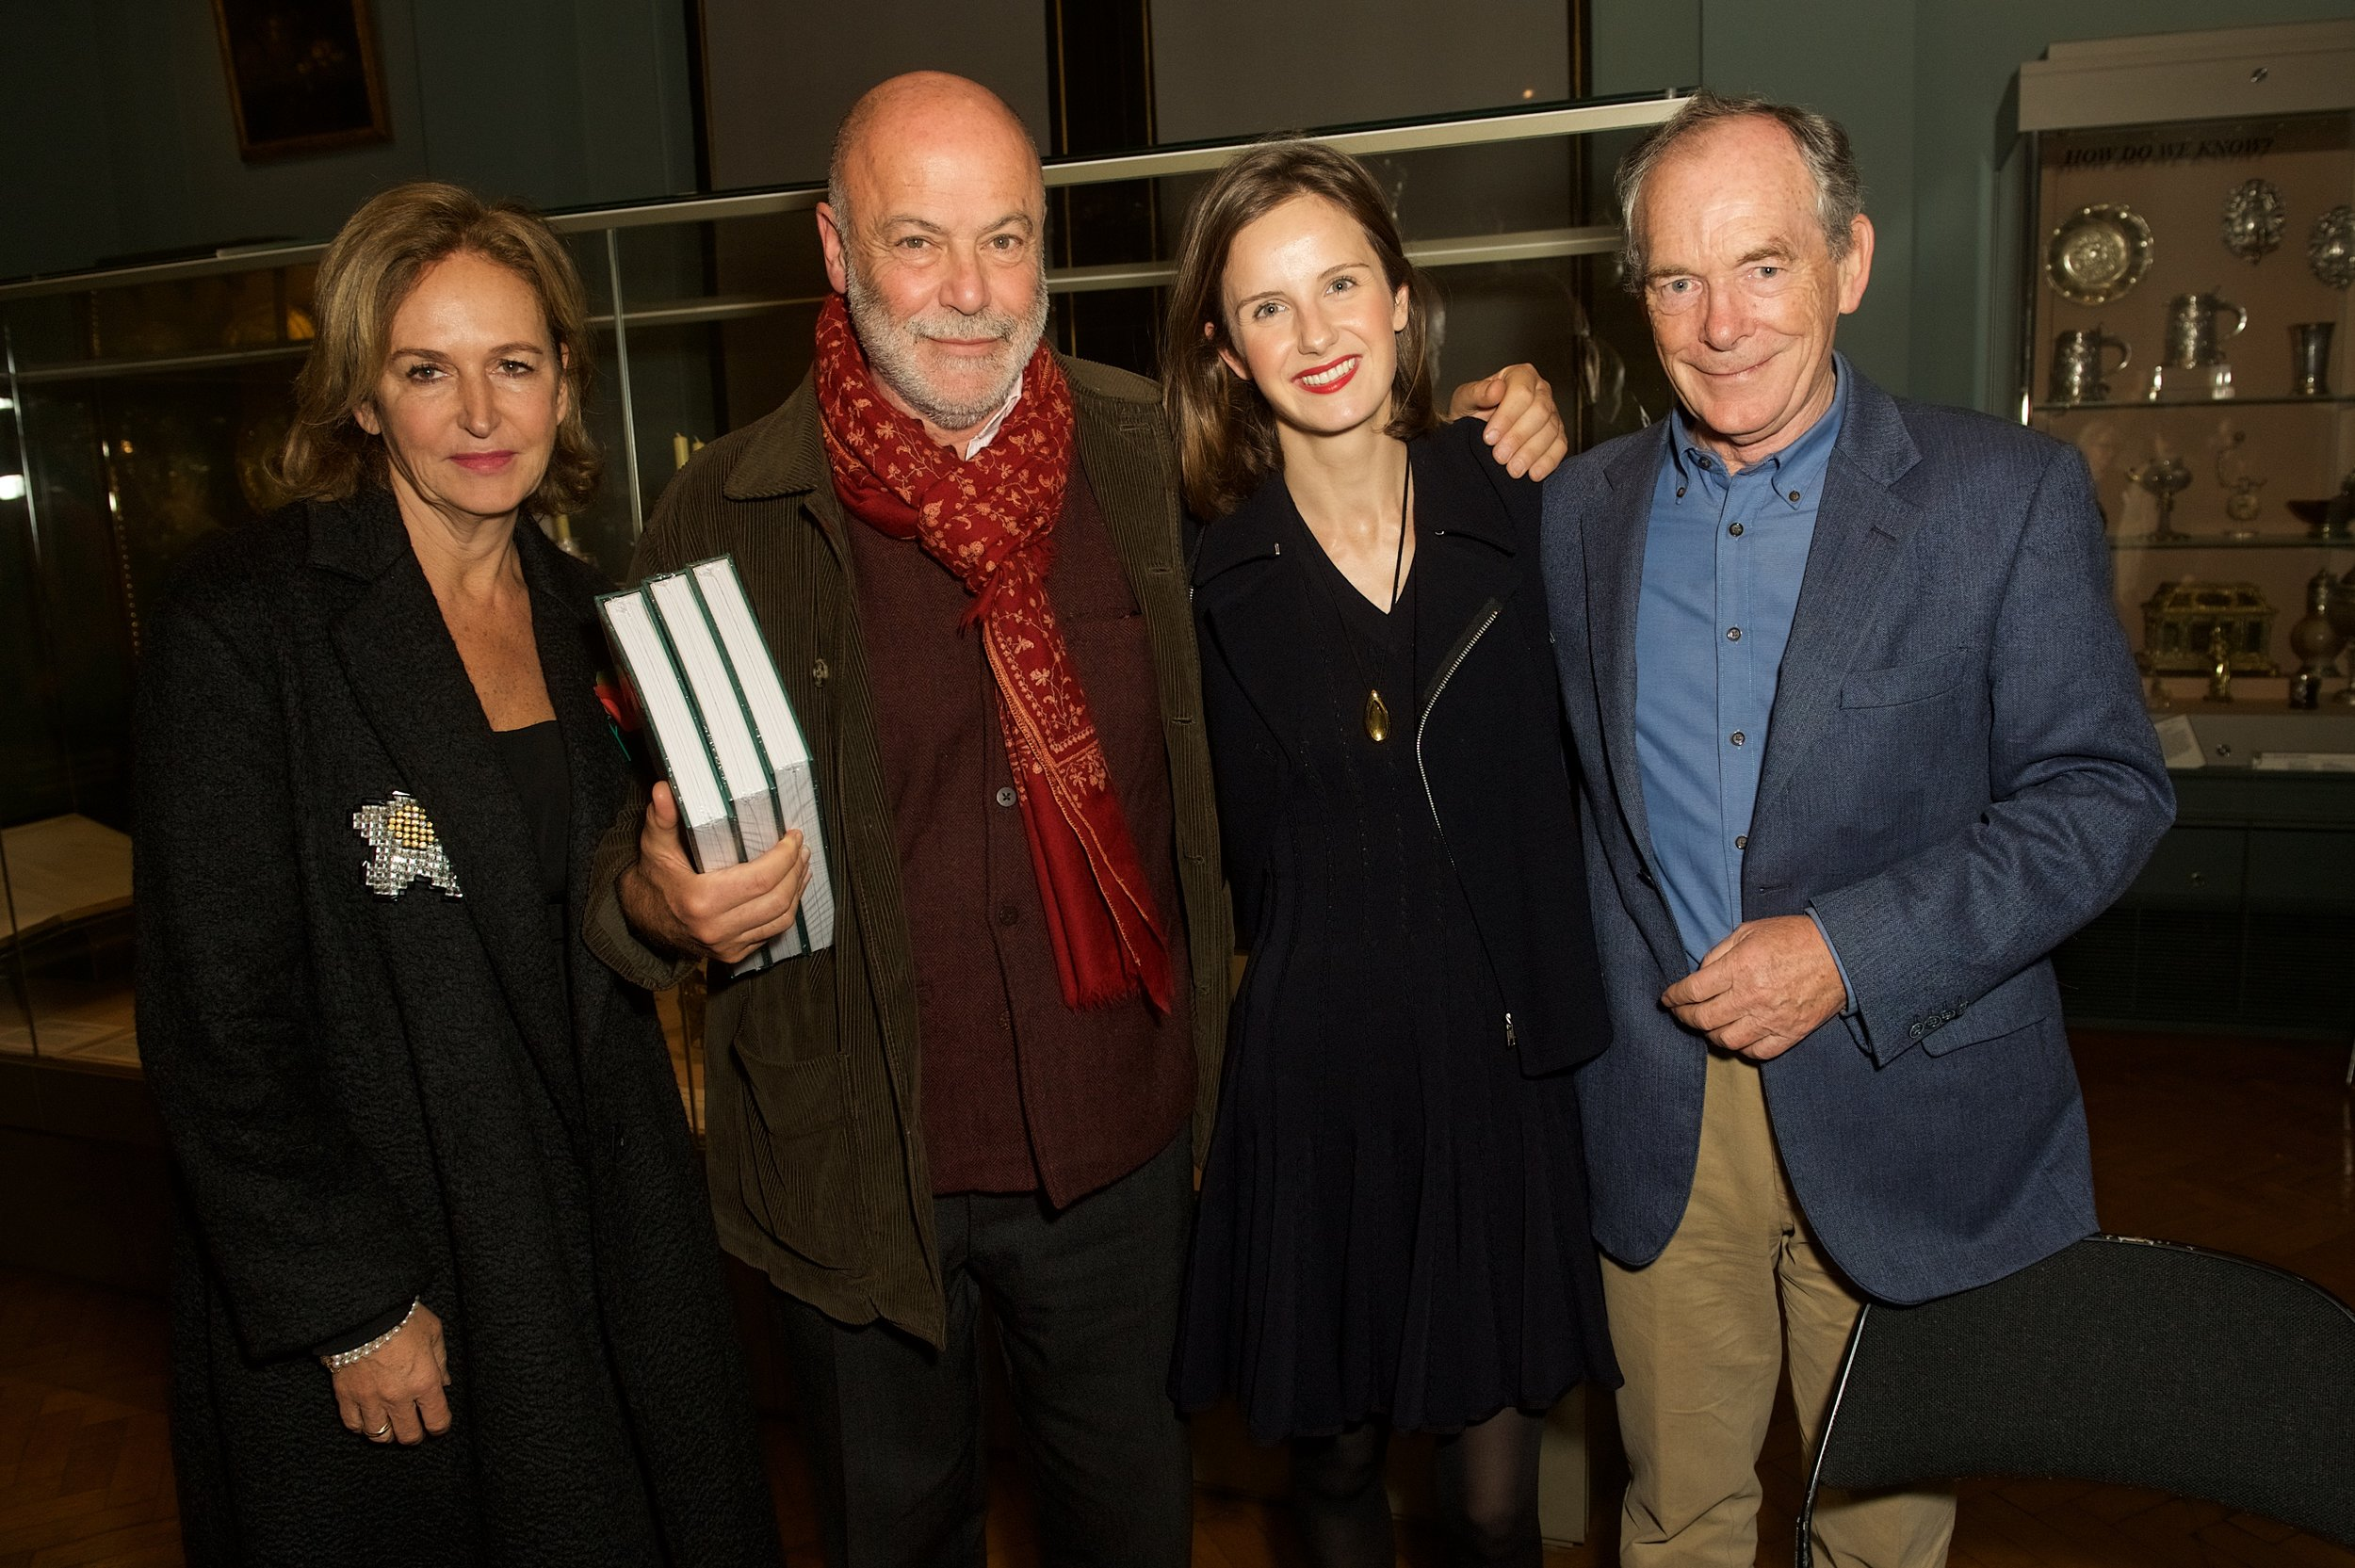 Caroline Michel, John Eskanazi, Sophie Walker and Simon Jenkins